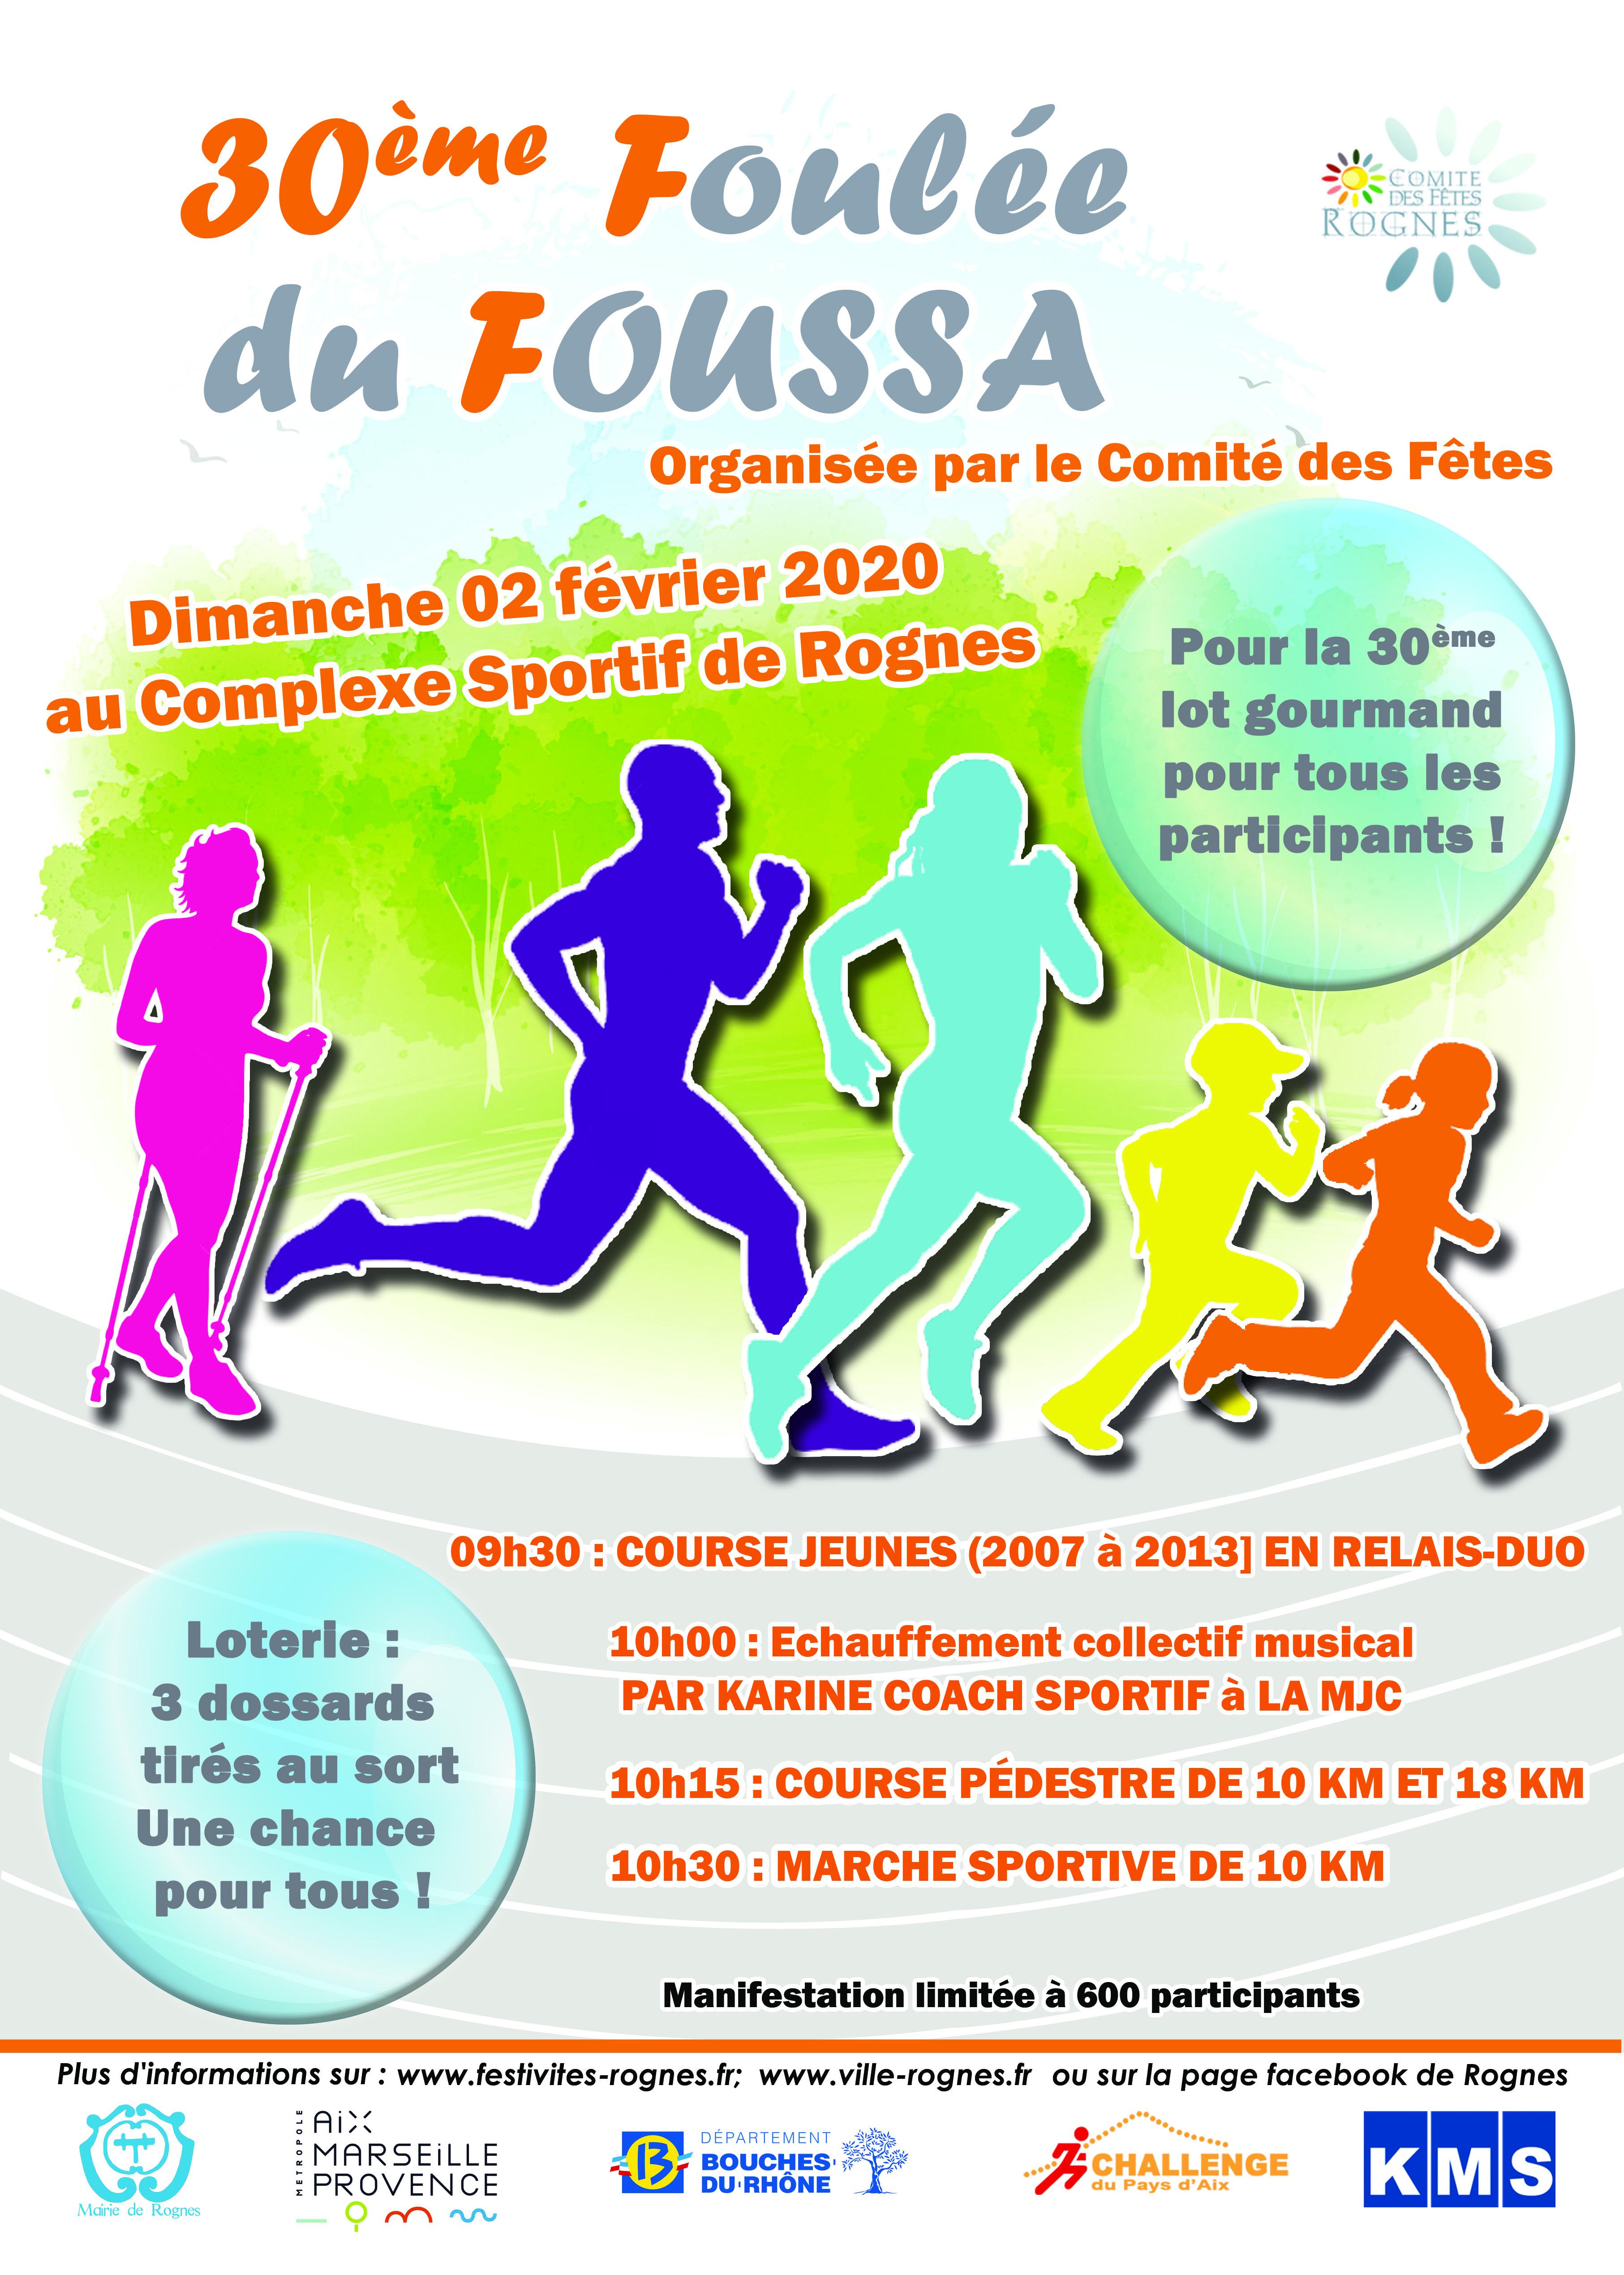 Foulee du Foussa - Marche Sportive 10km sportive